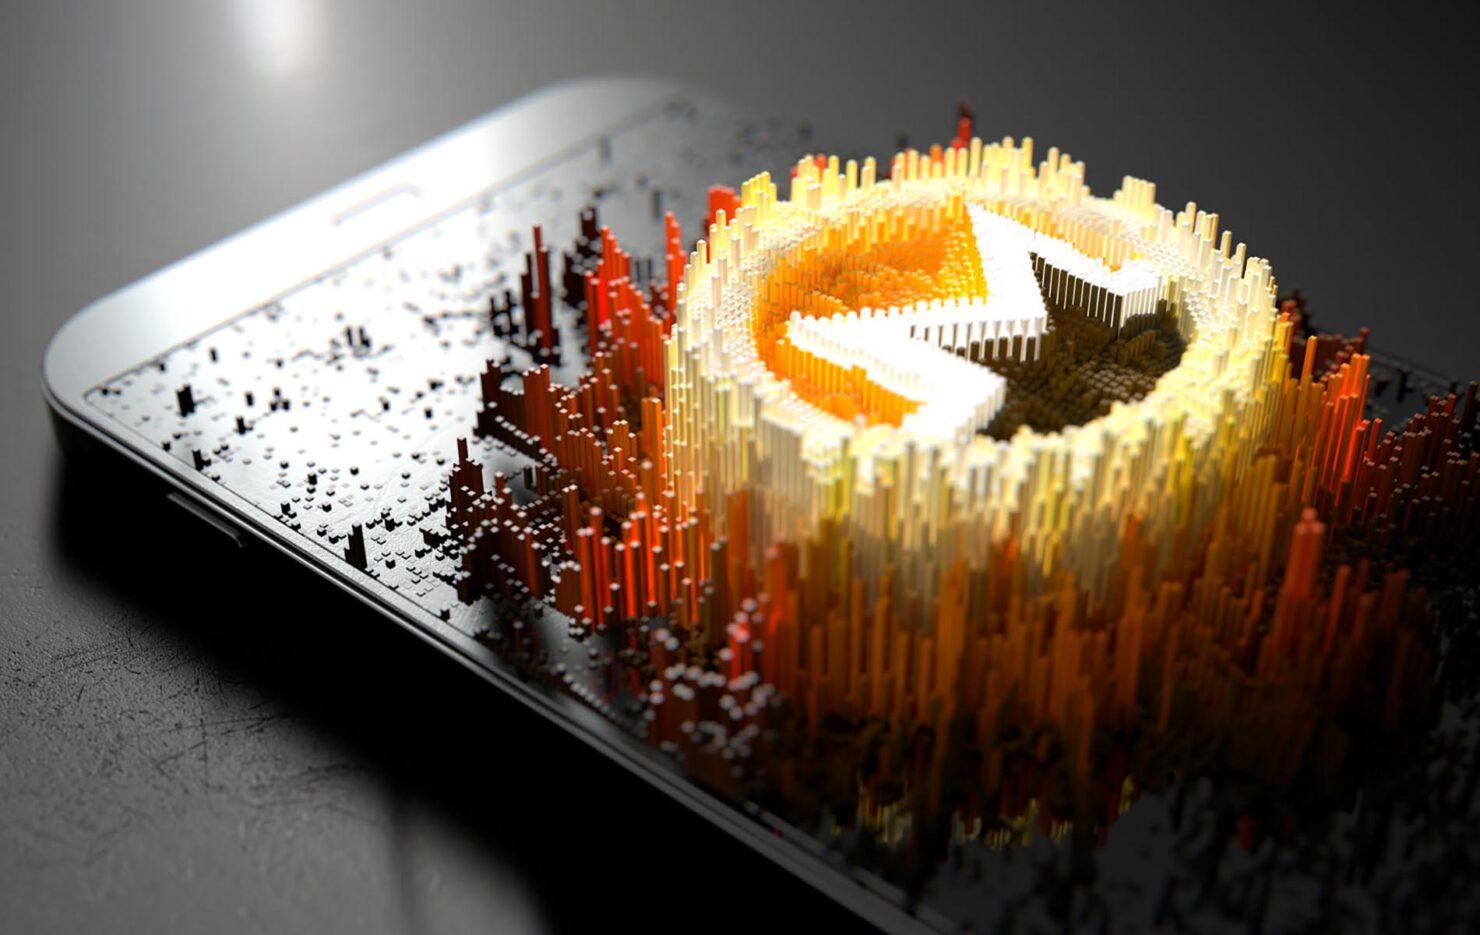 Android malware cryptojacking Monero Cryptocurrency